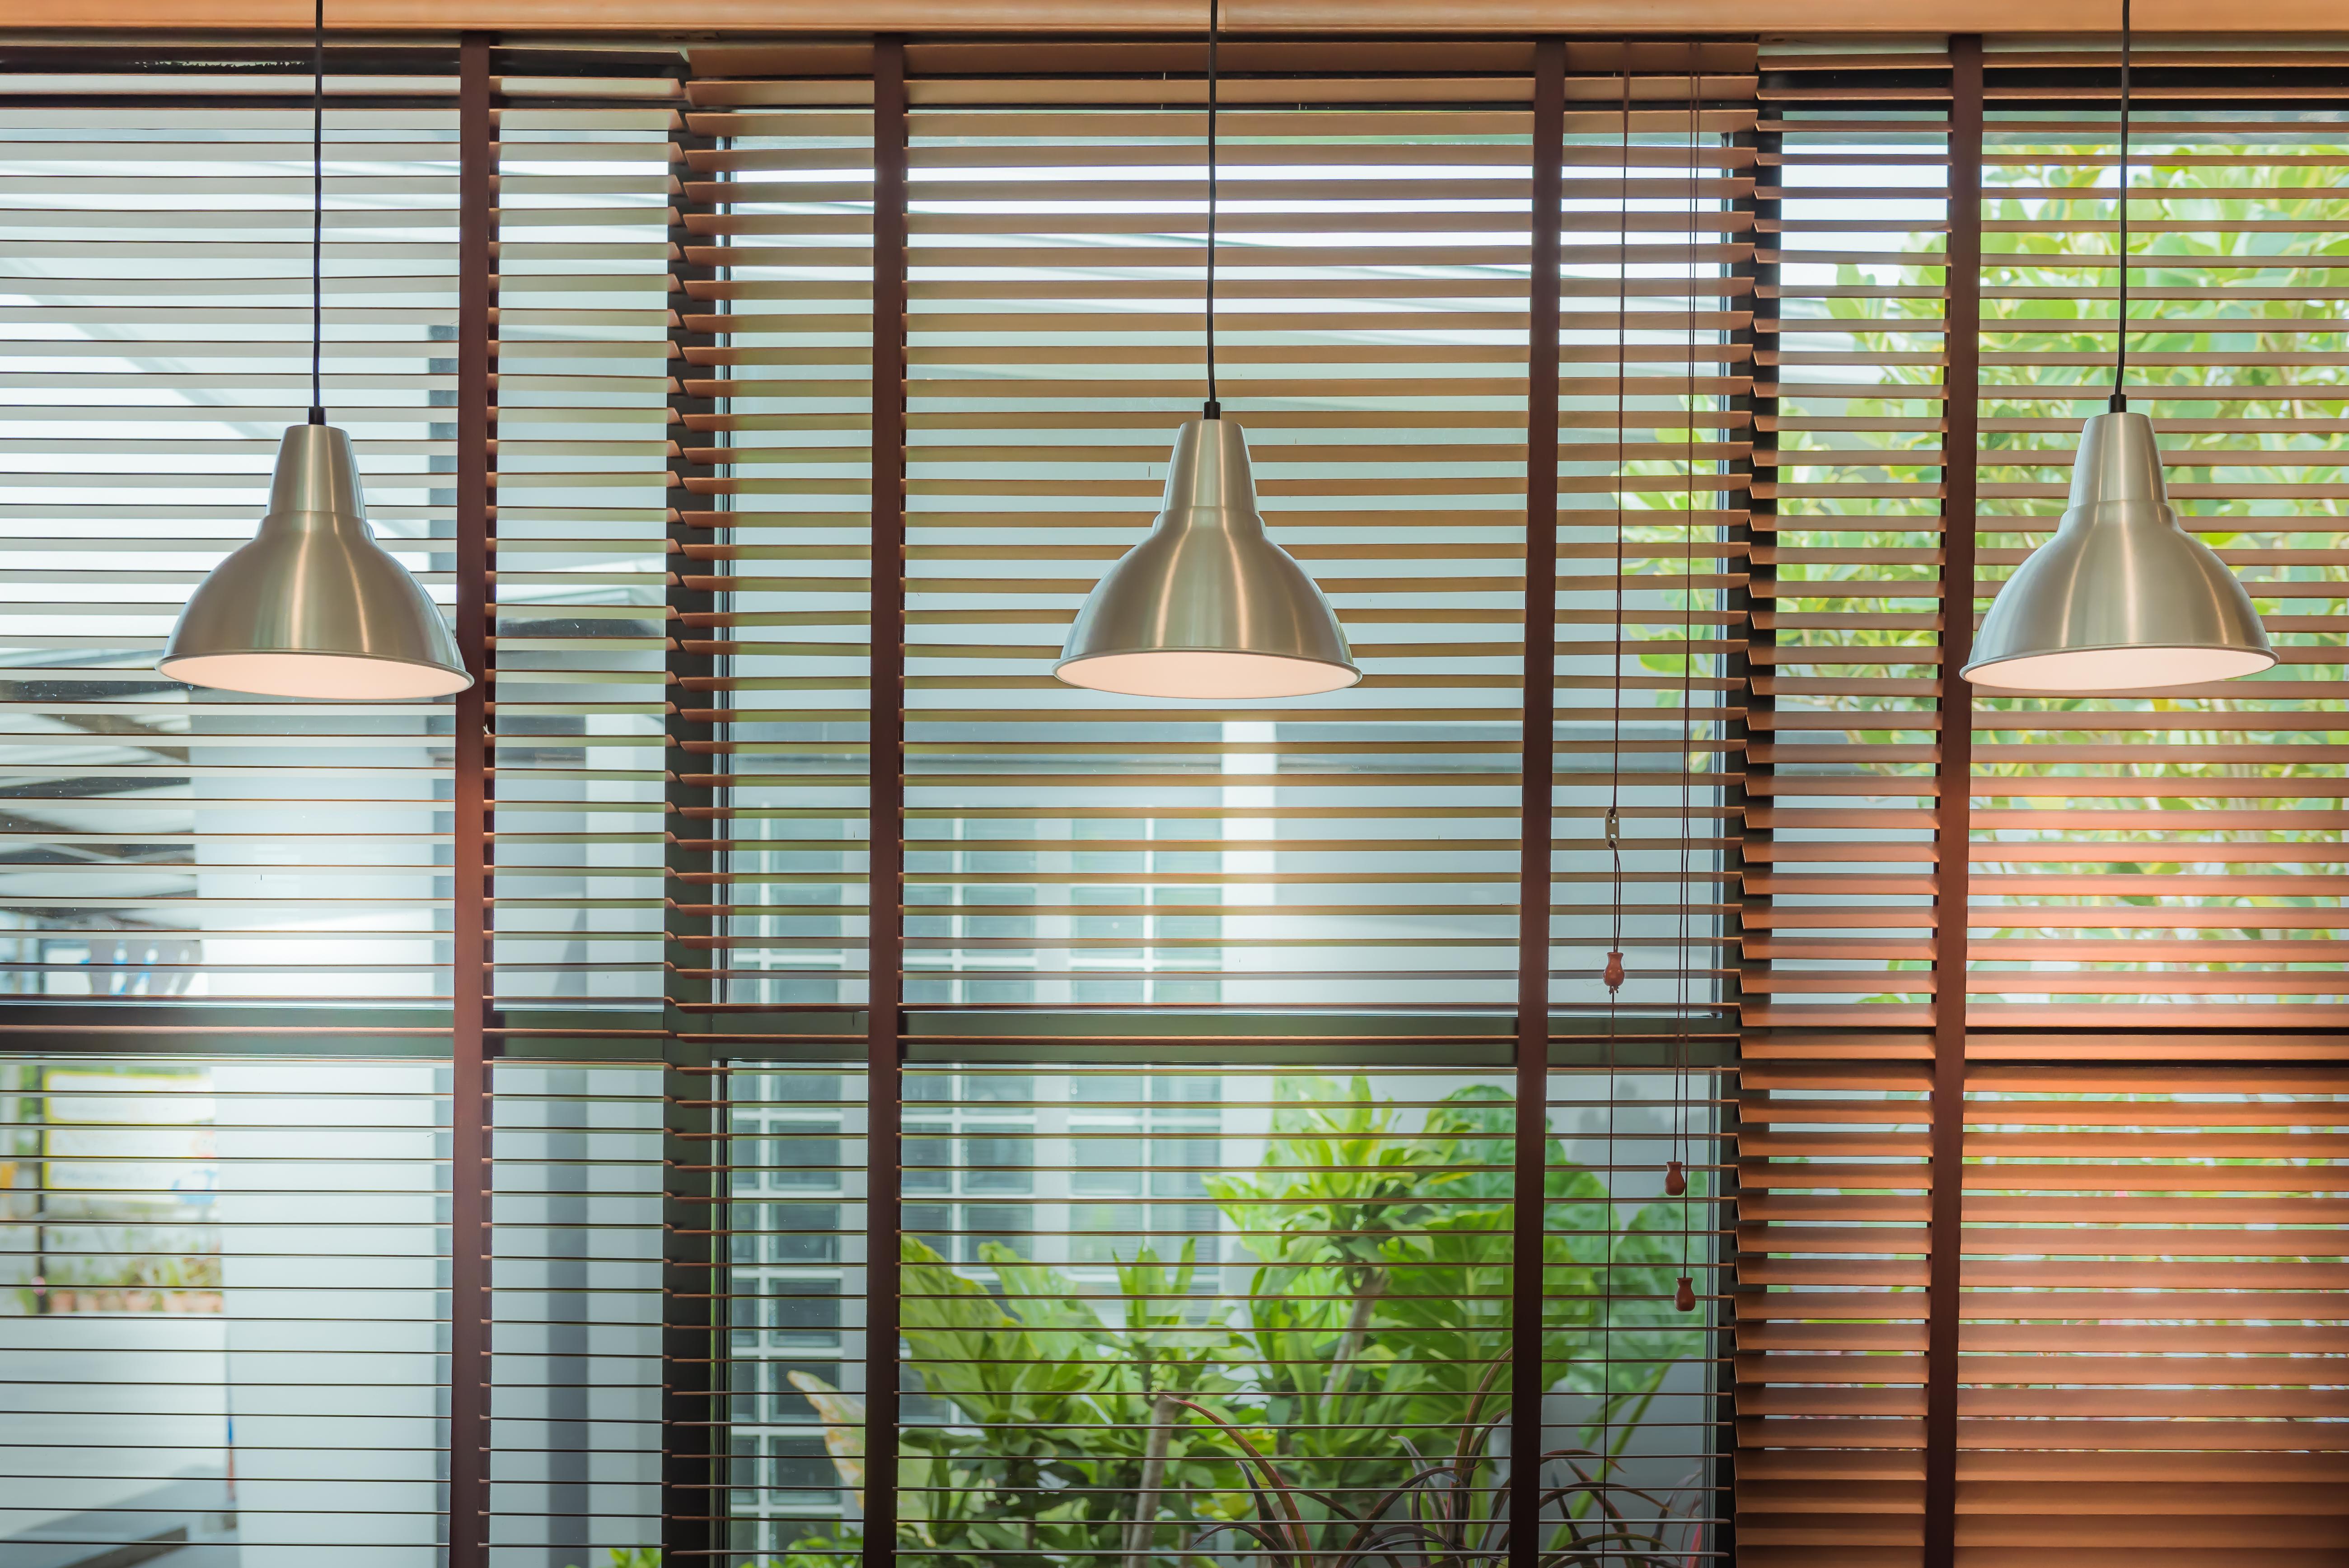 Office Venetian blinds with spotlights.